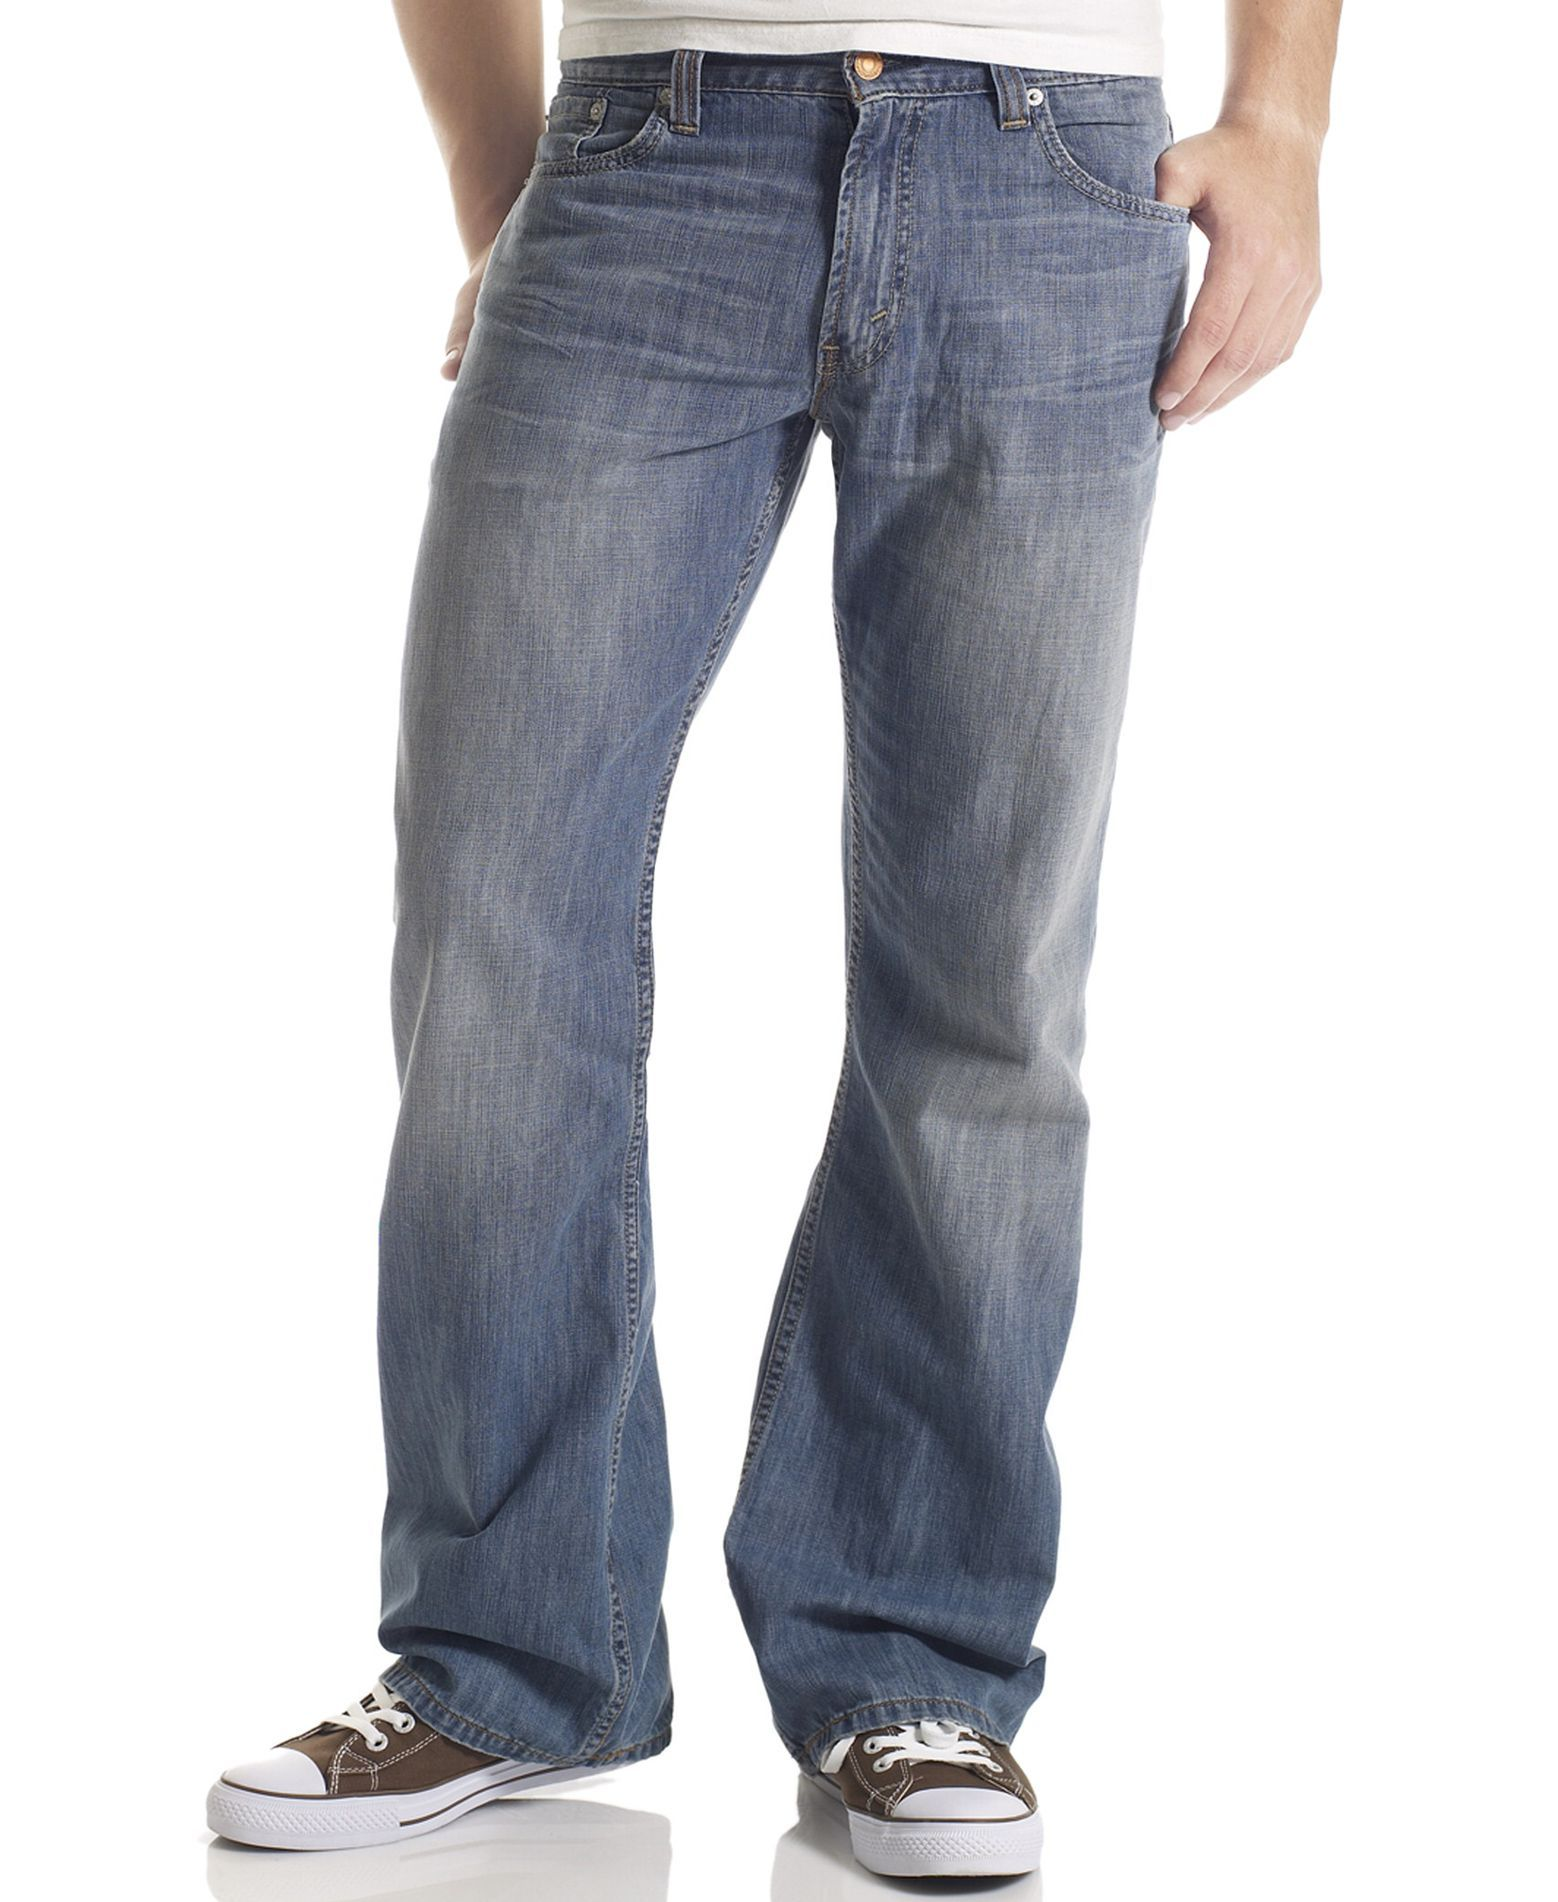 Fit Wash Bootcut Chipped Levi's 527 Medium Slim Jeans SzpqVMLUG